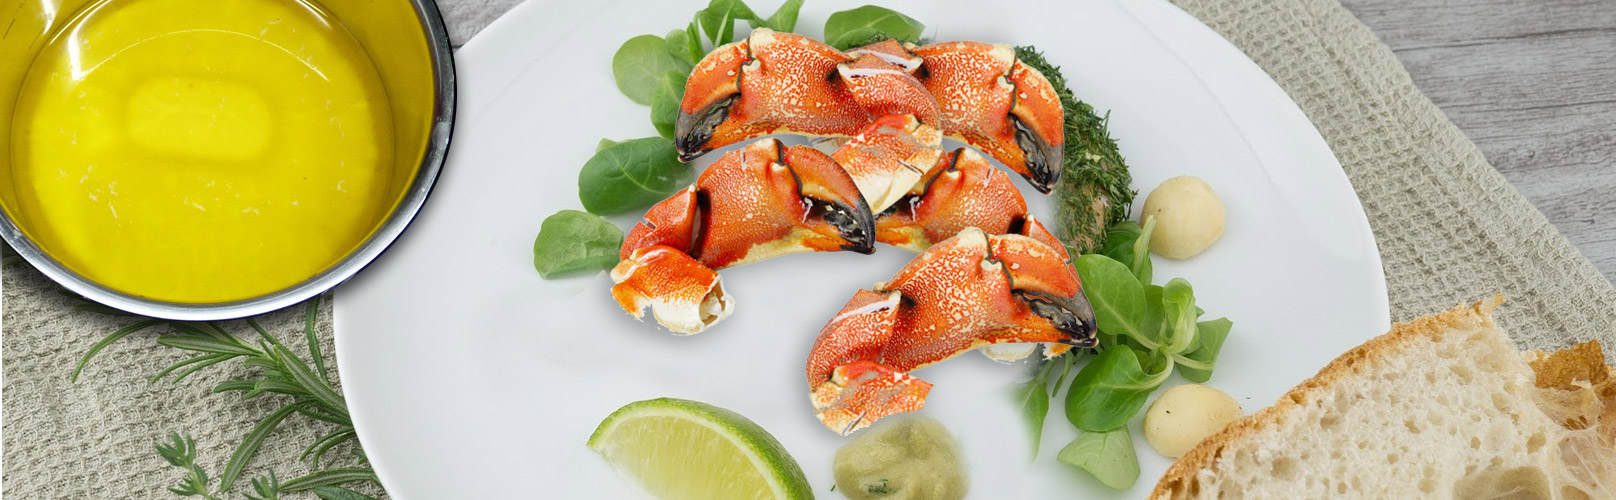 jonah-crab plated